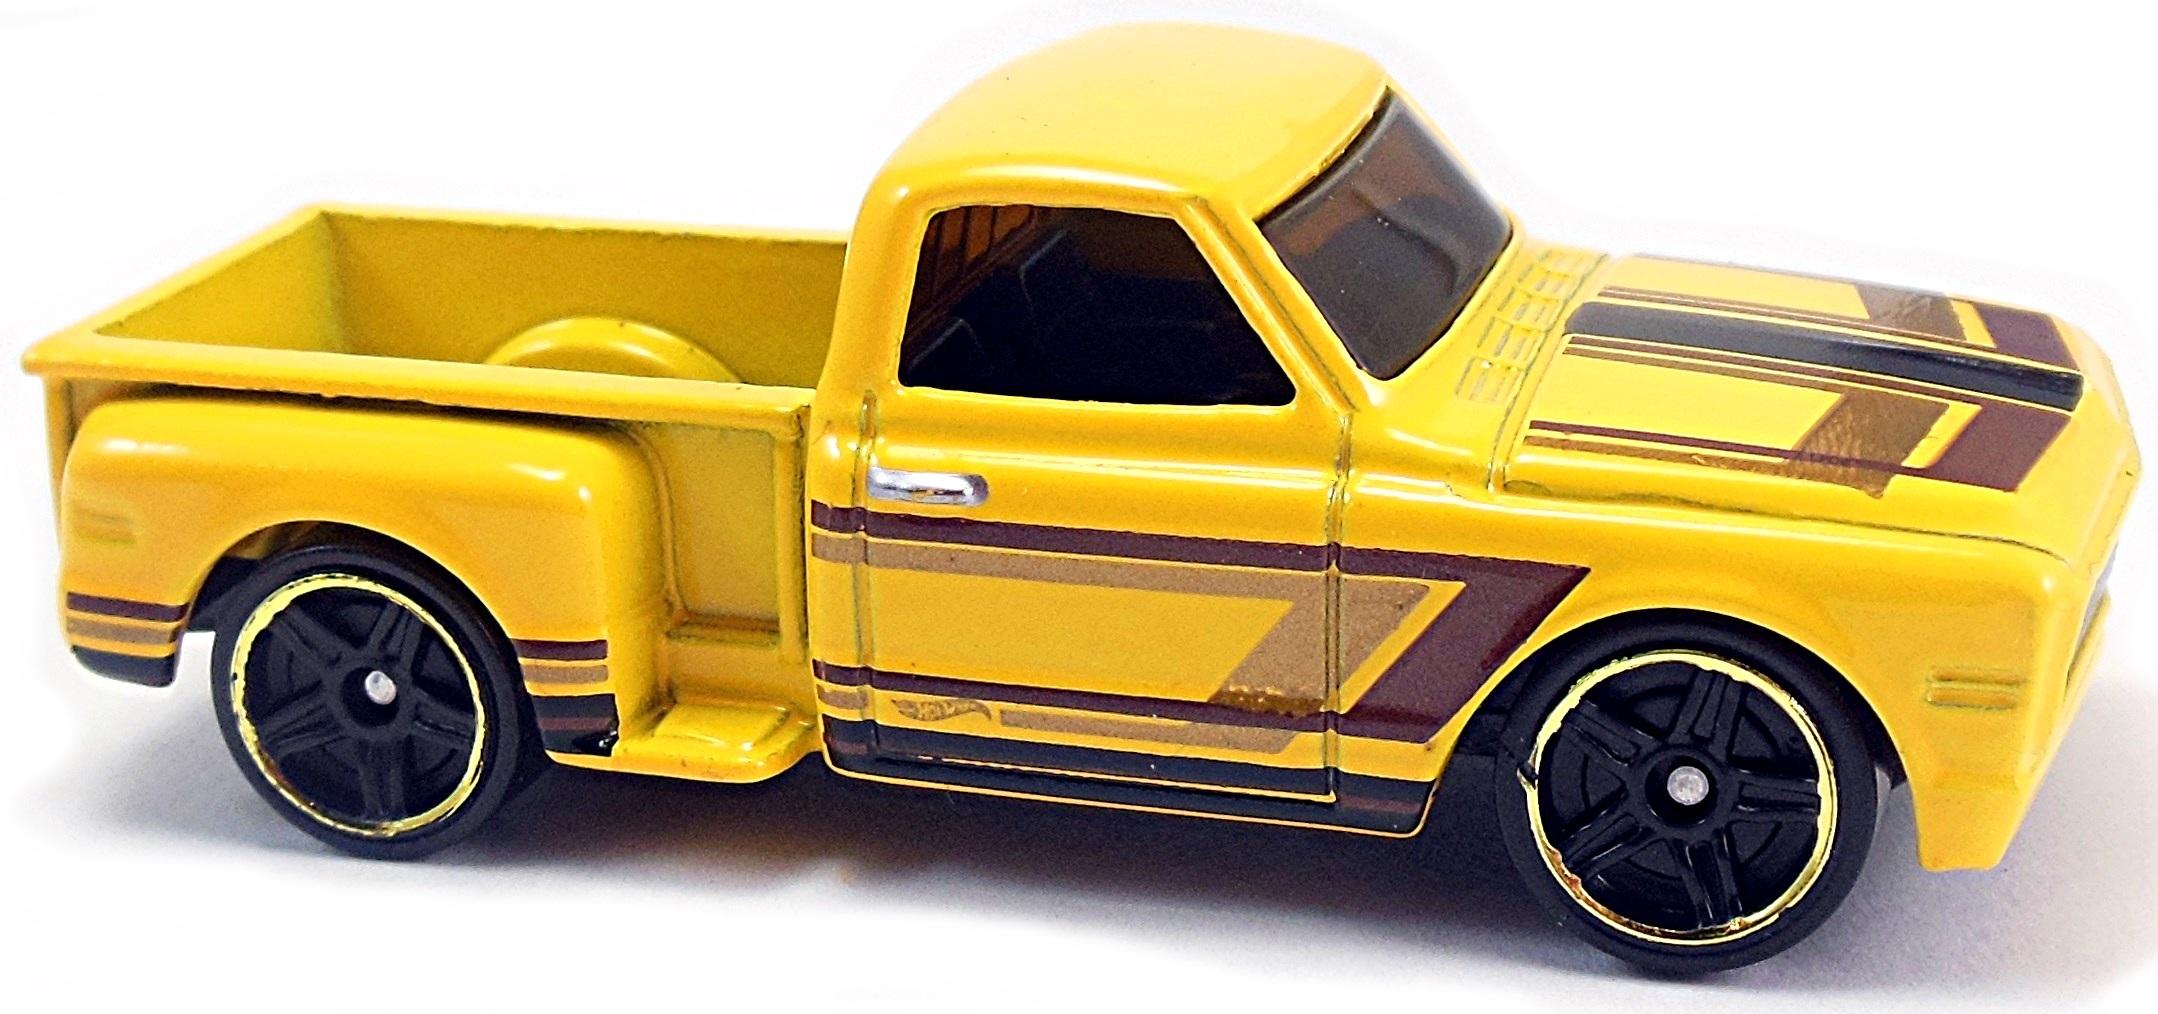 Chevy Alaskan Edition >> Custom Chevy Silverado Trucks | Autos Post